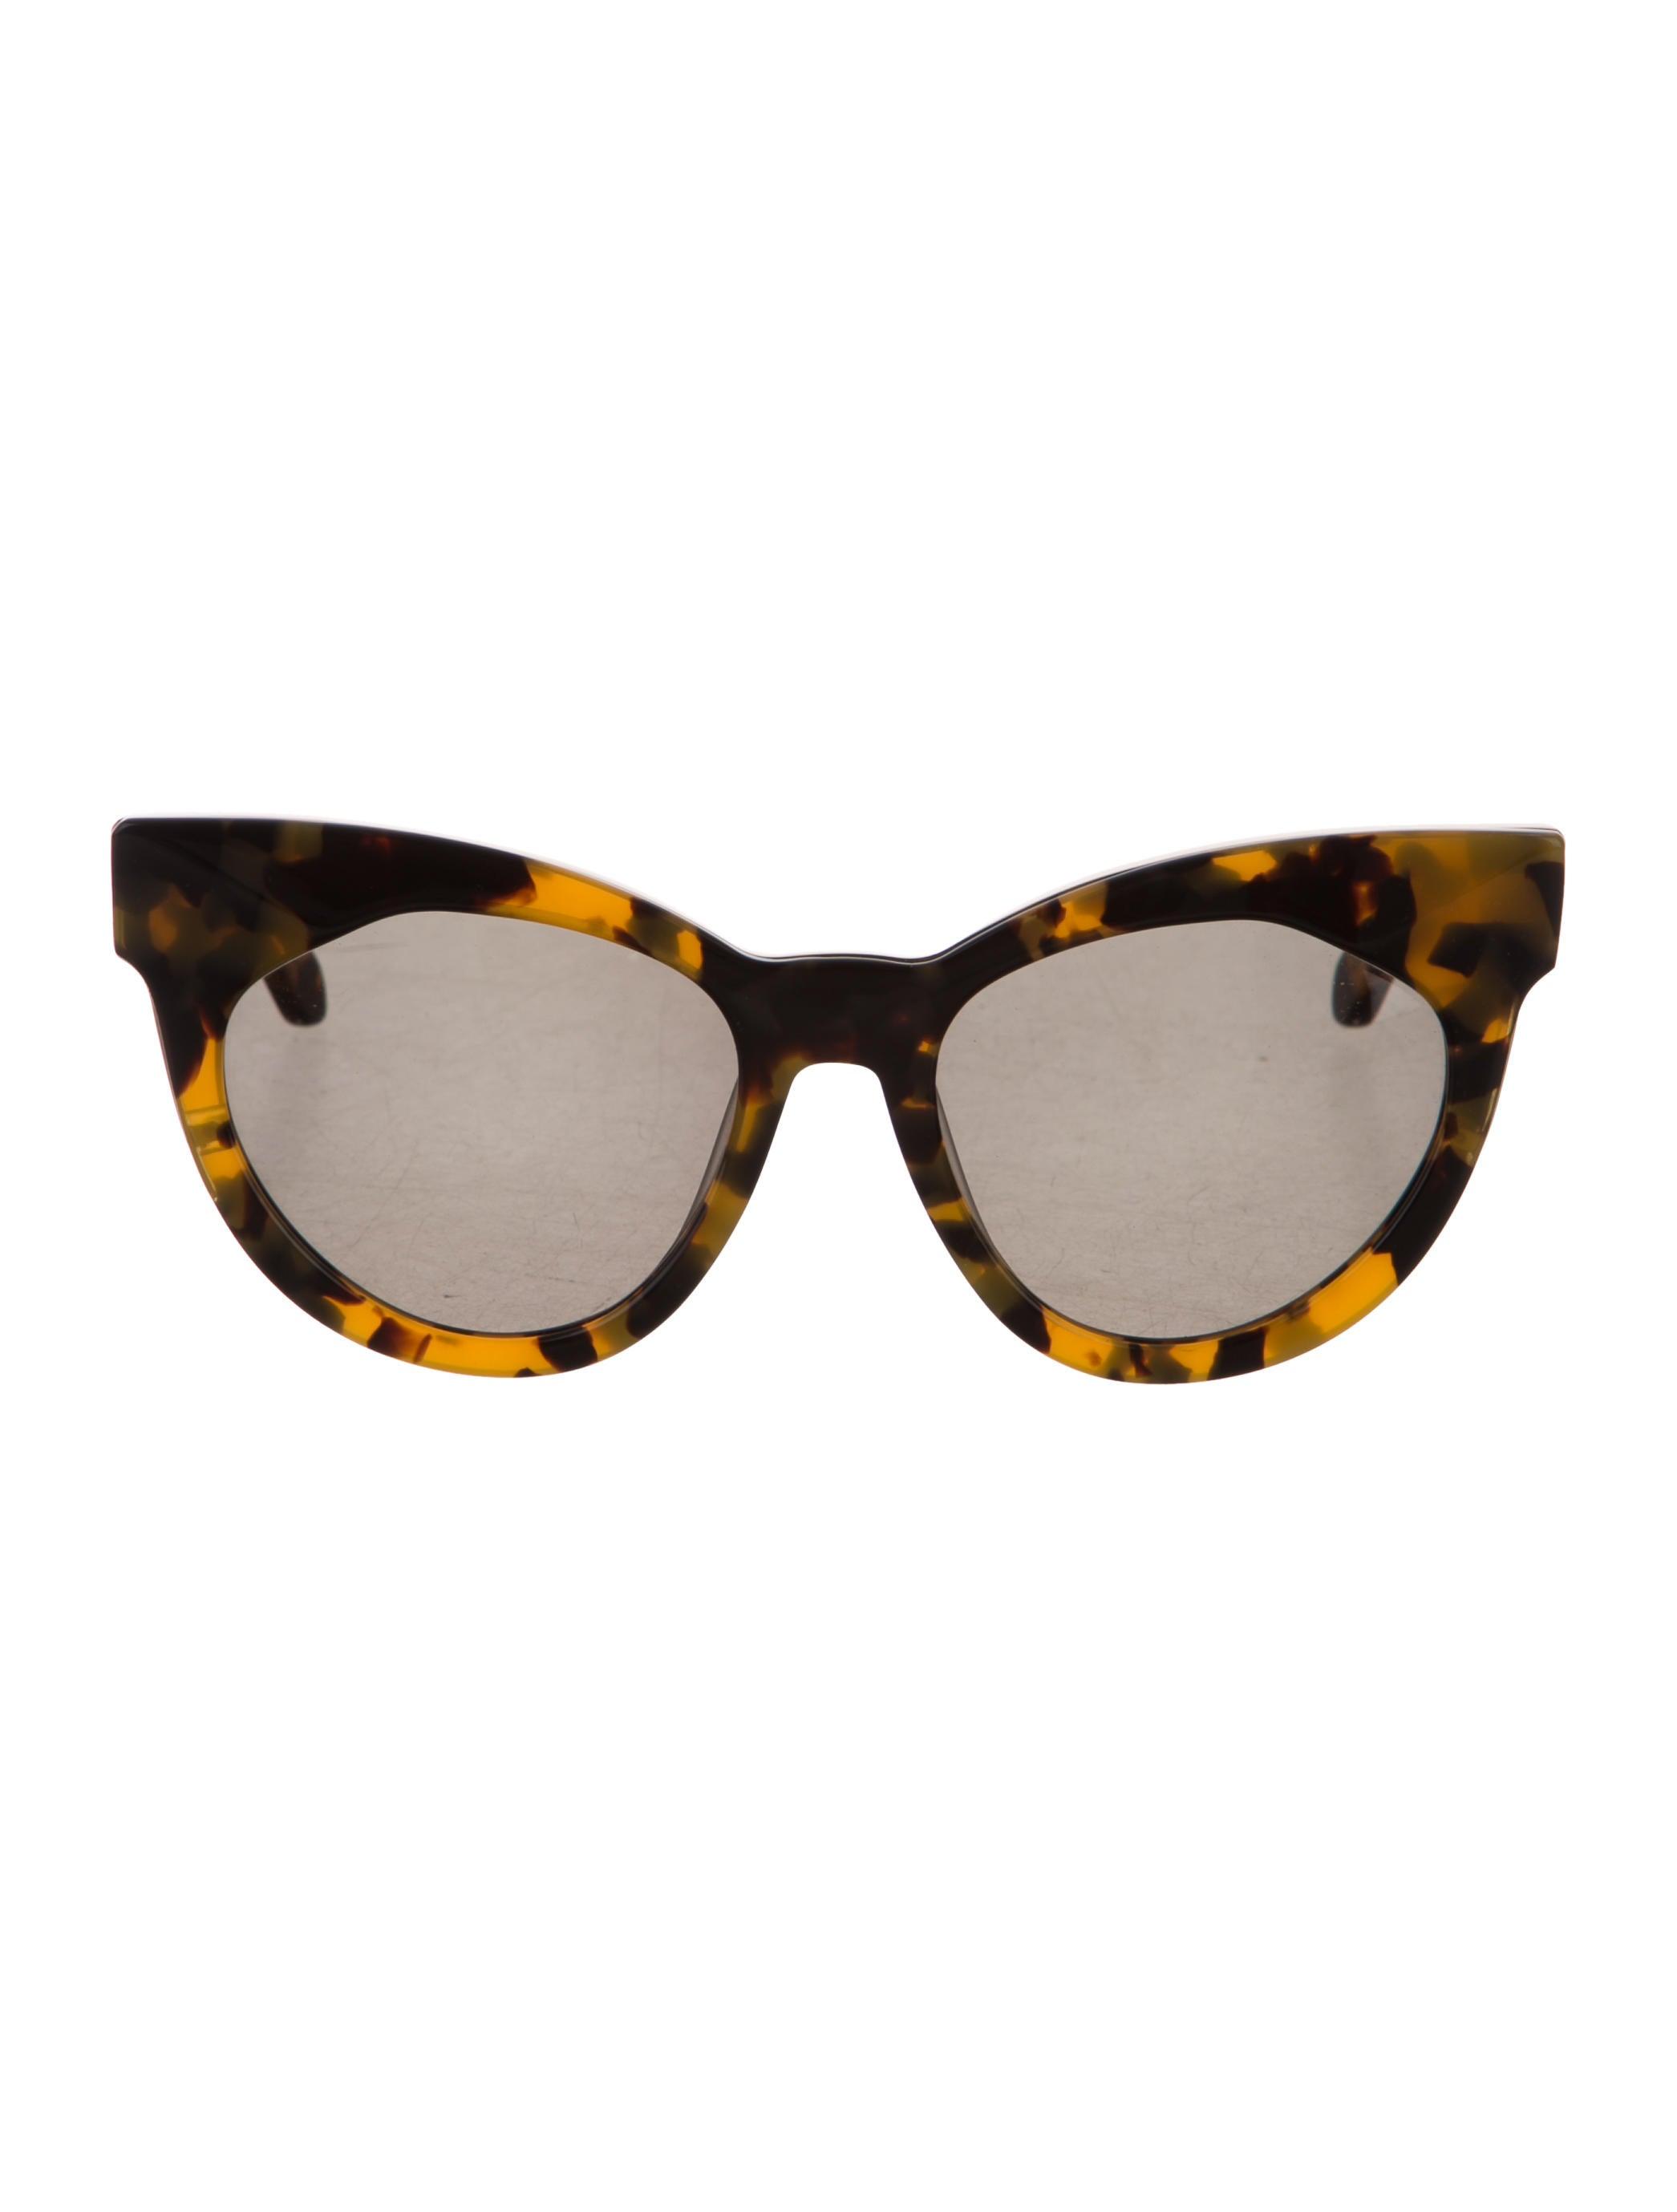 f22efaeadf3 Karen Walker Starburst Cat-Eye Sunglasses - Accessories - KAR21125 ...